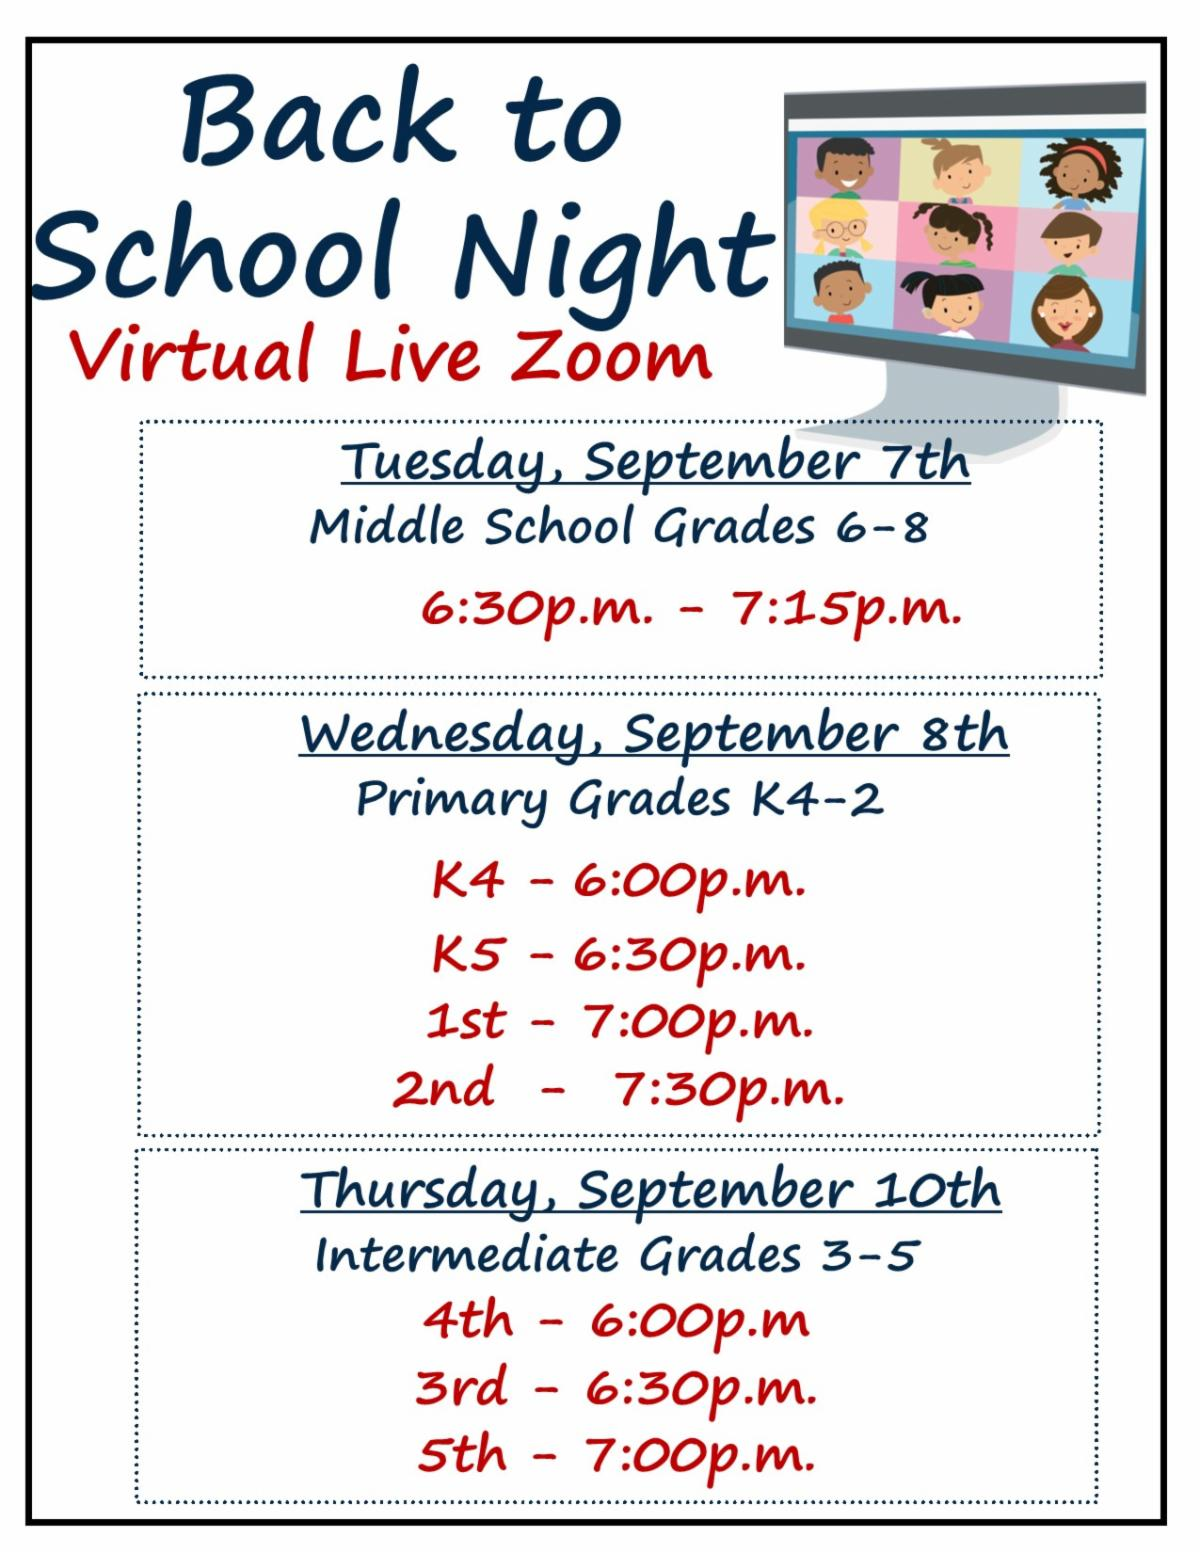 Back to School Night Virtual Zoom 2021-202.jpg